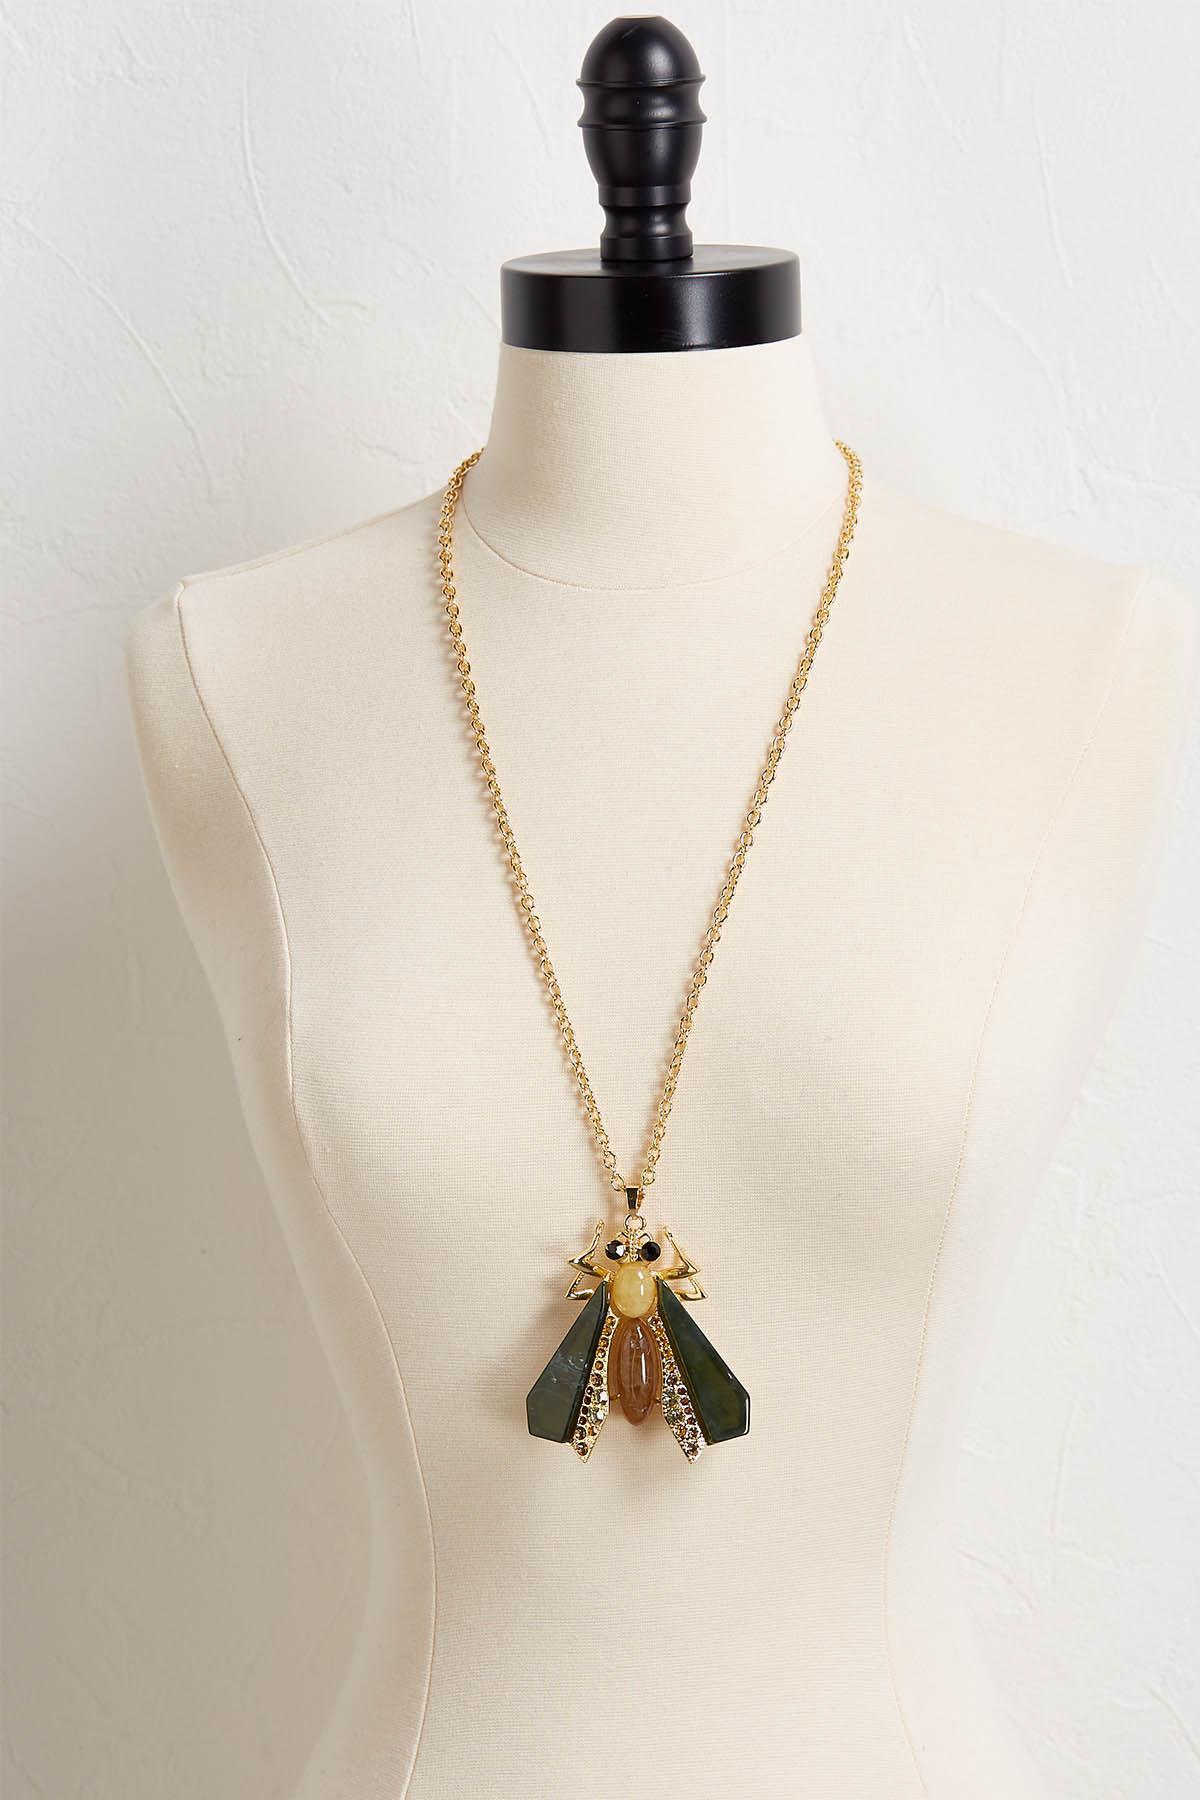 Winged Bug Pendant Necklace